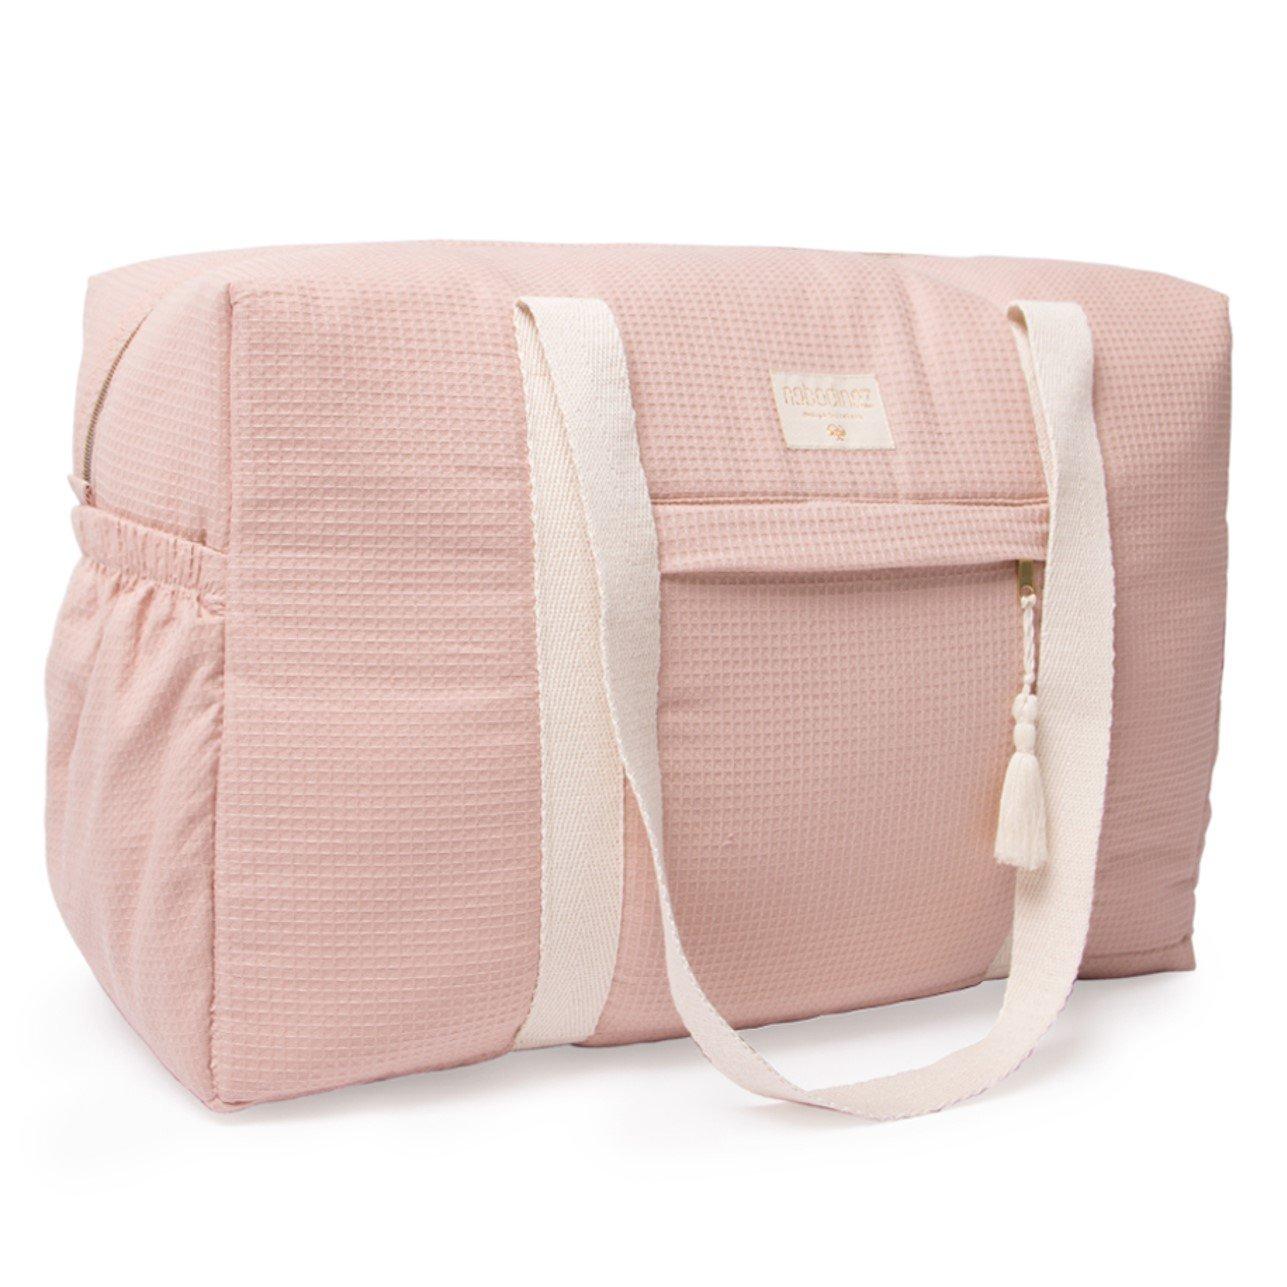 sac de maternite opera nobodinoz bio rose